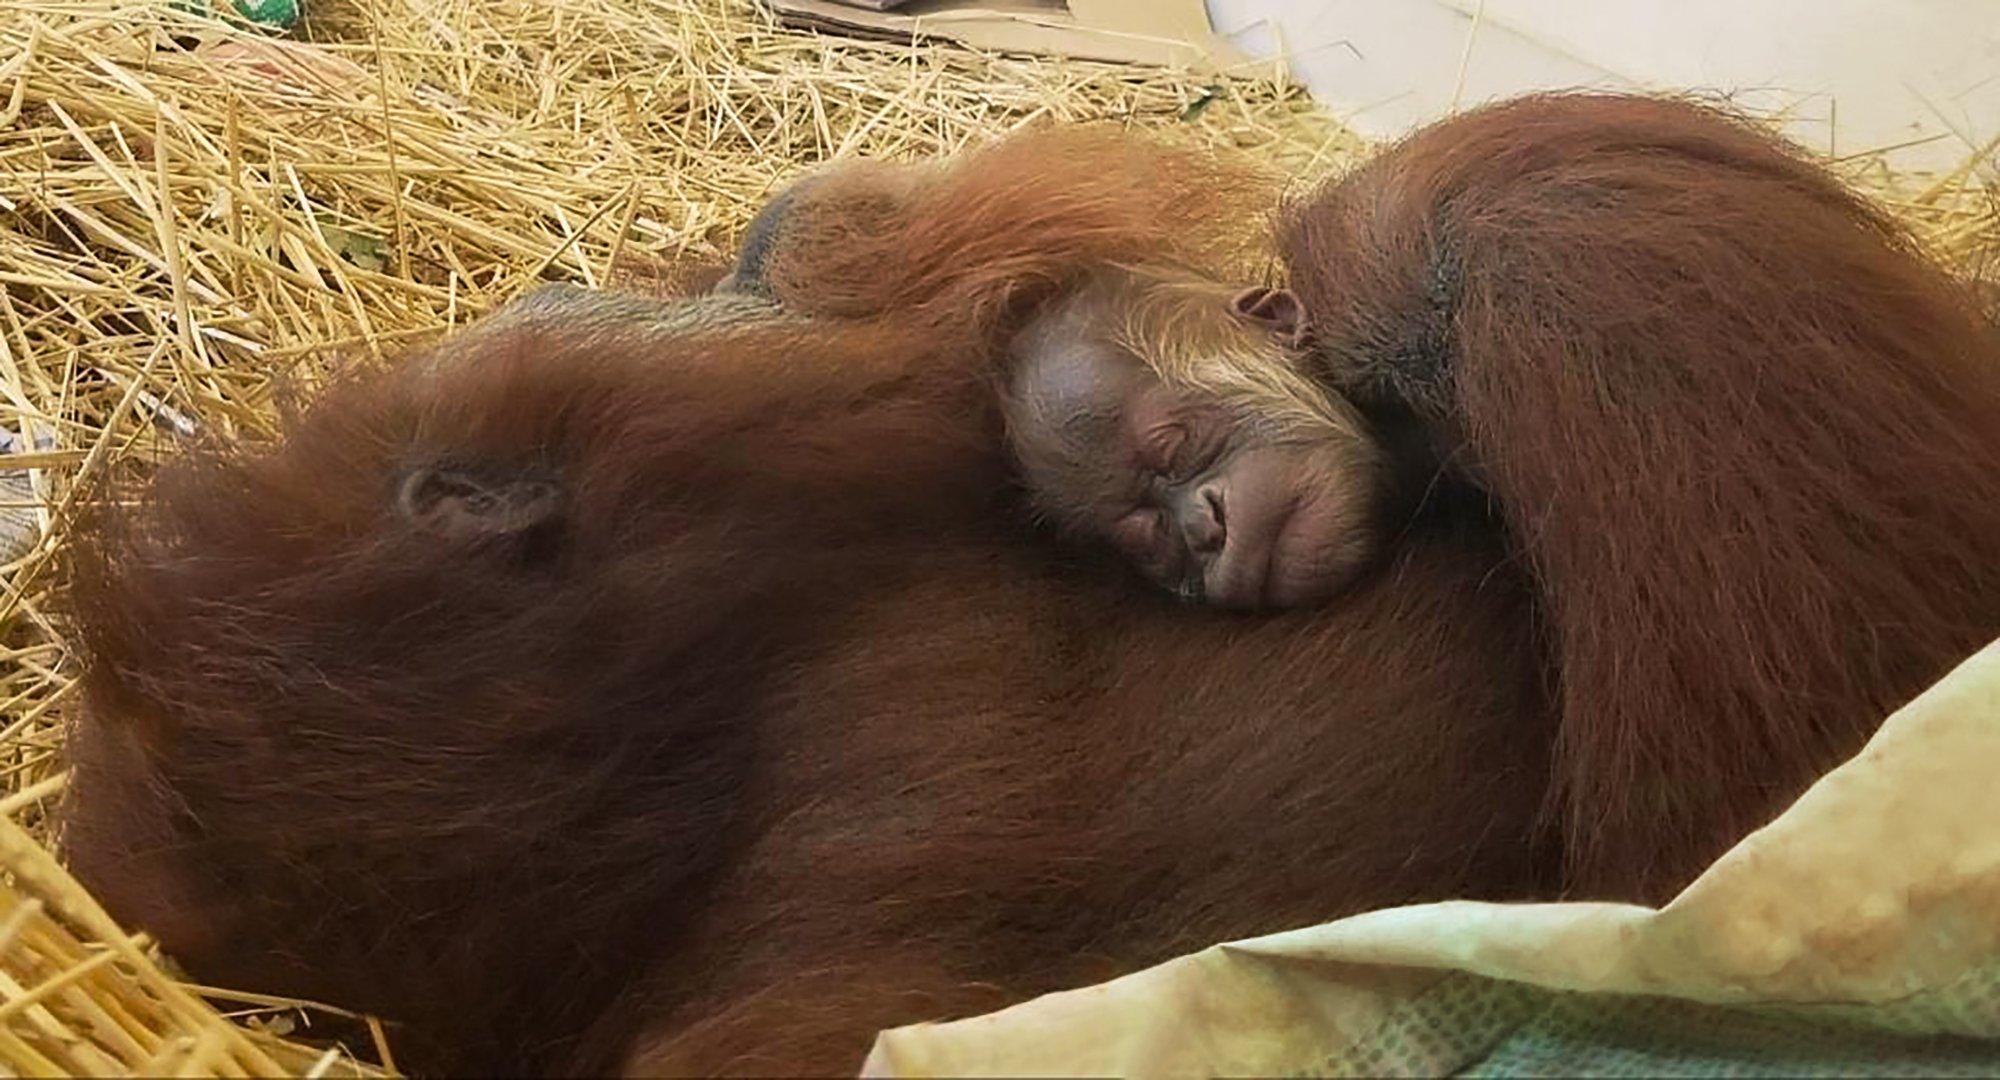 It's an orangutan! Endangered species born at Audubon Zoo